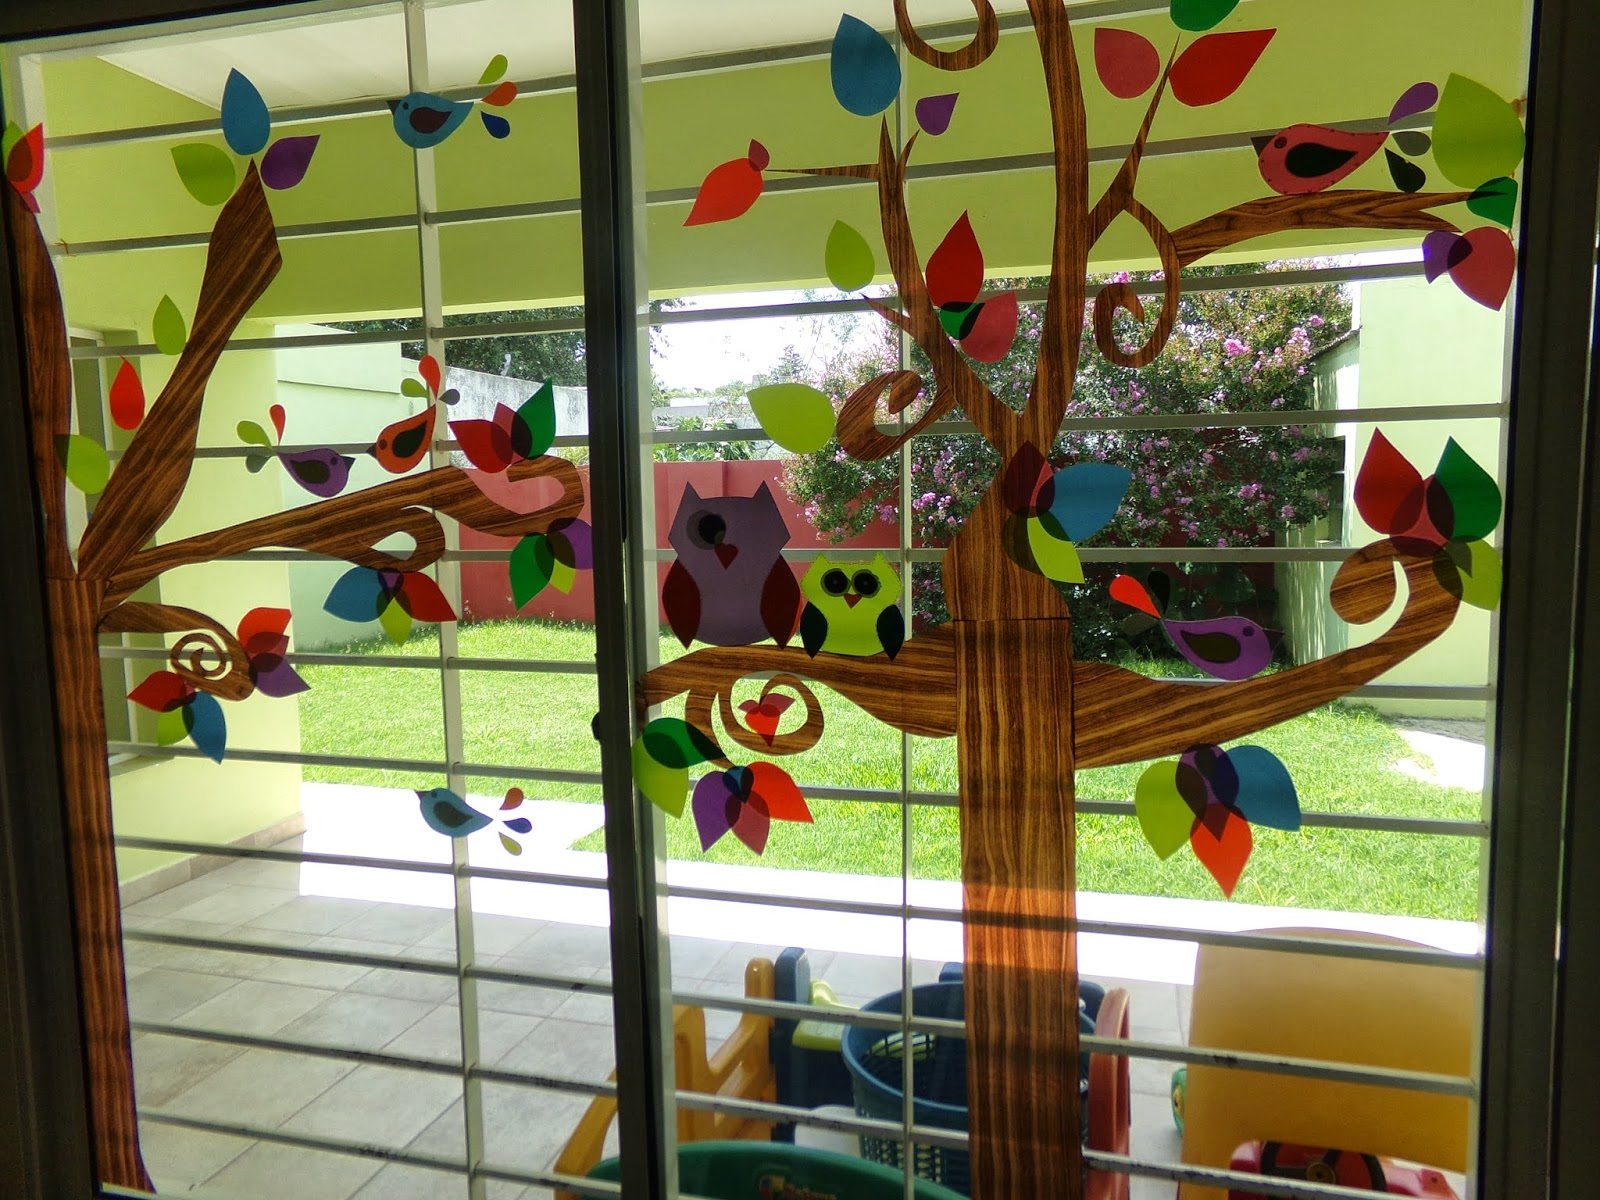 Jard n maternal creciendo kids for Decoracion jardin maternal